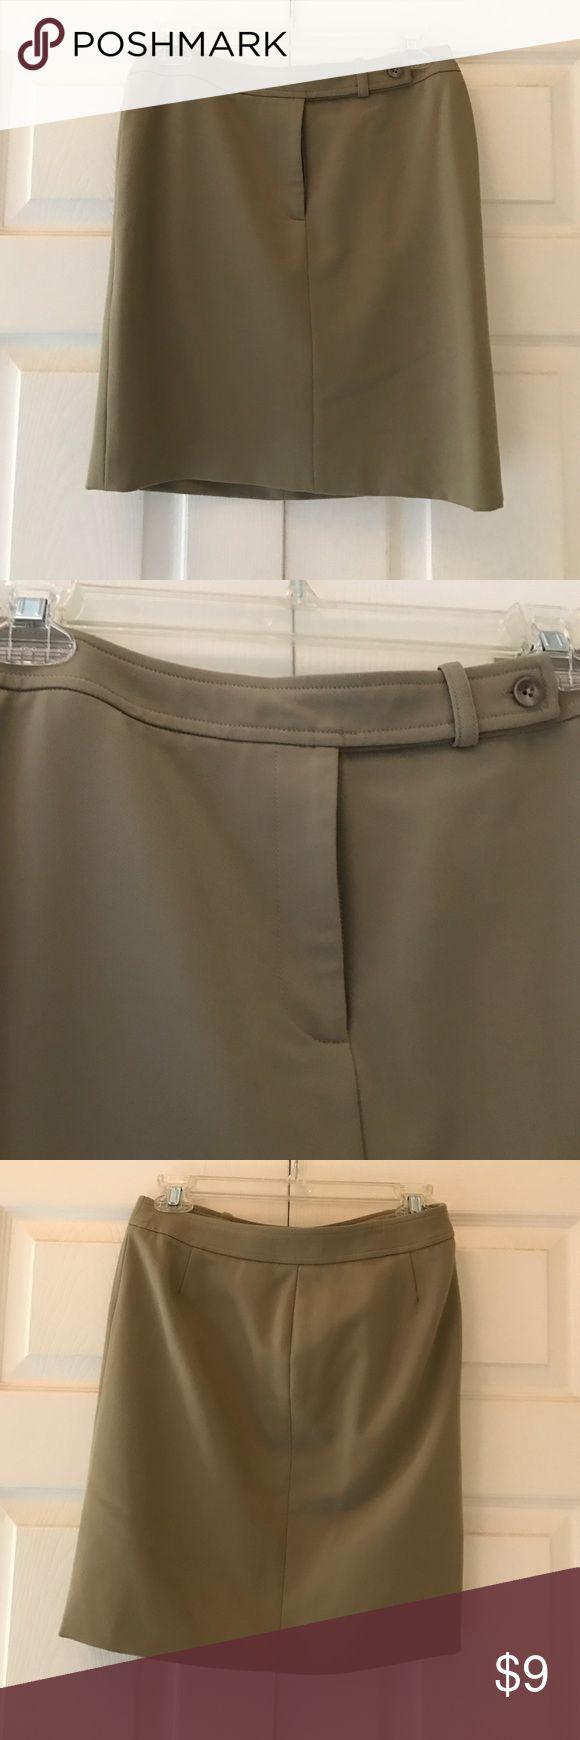 Short Pencil Skirt